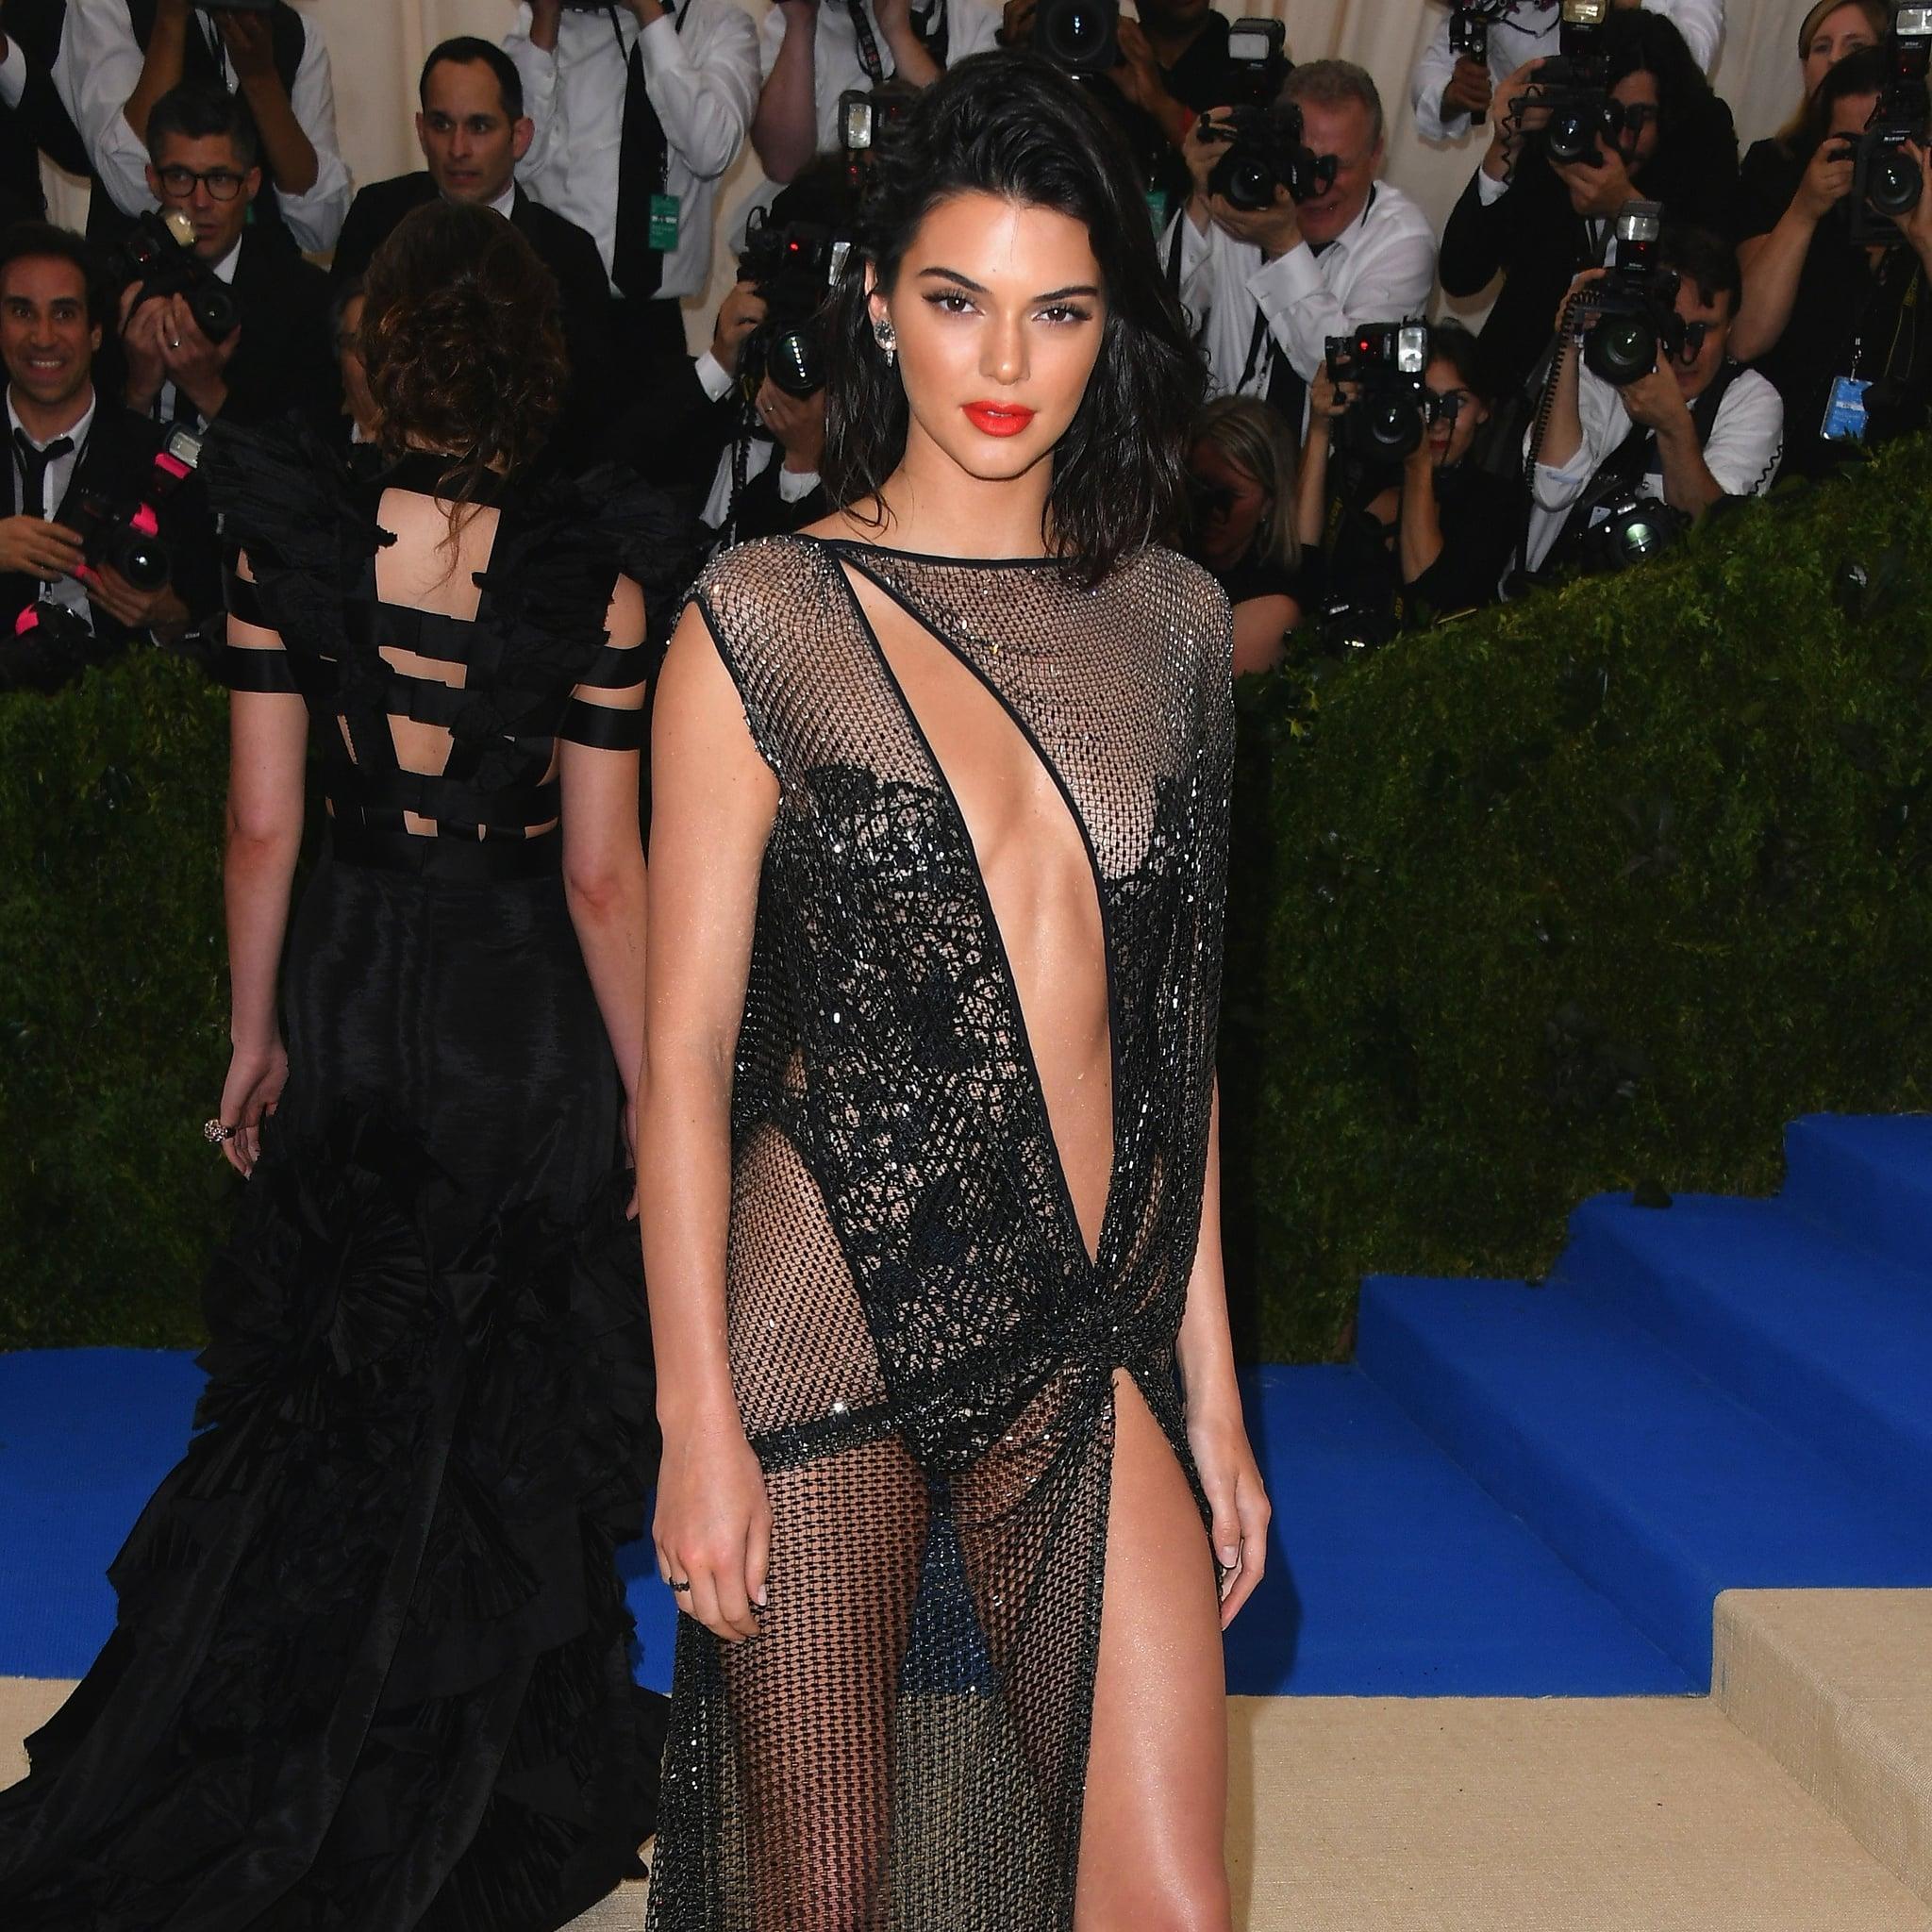 Kendall Jenner in La Perla Dress at Met Gala 2017 | POPSUGAR Fashion